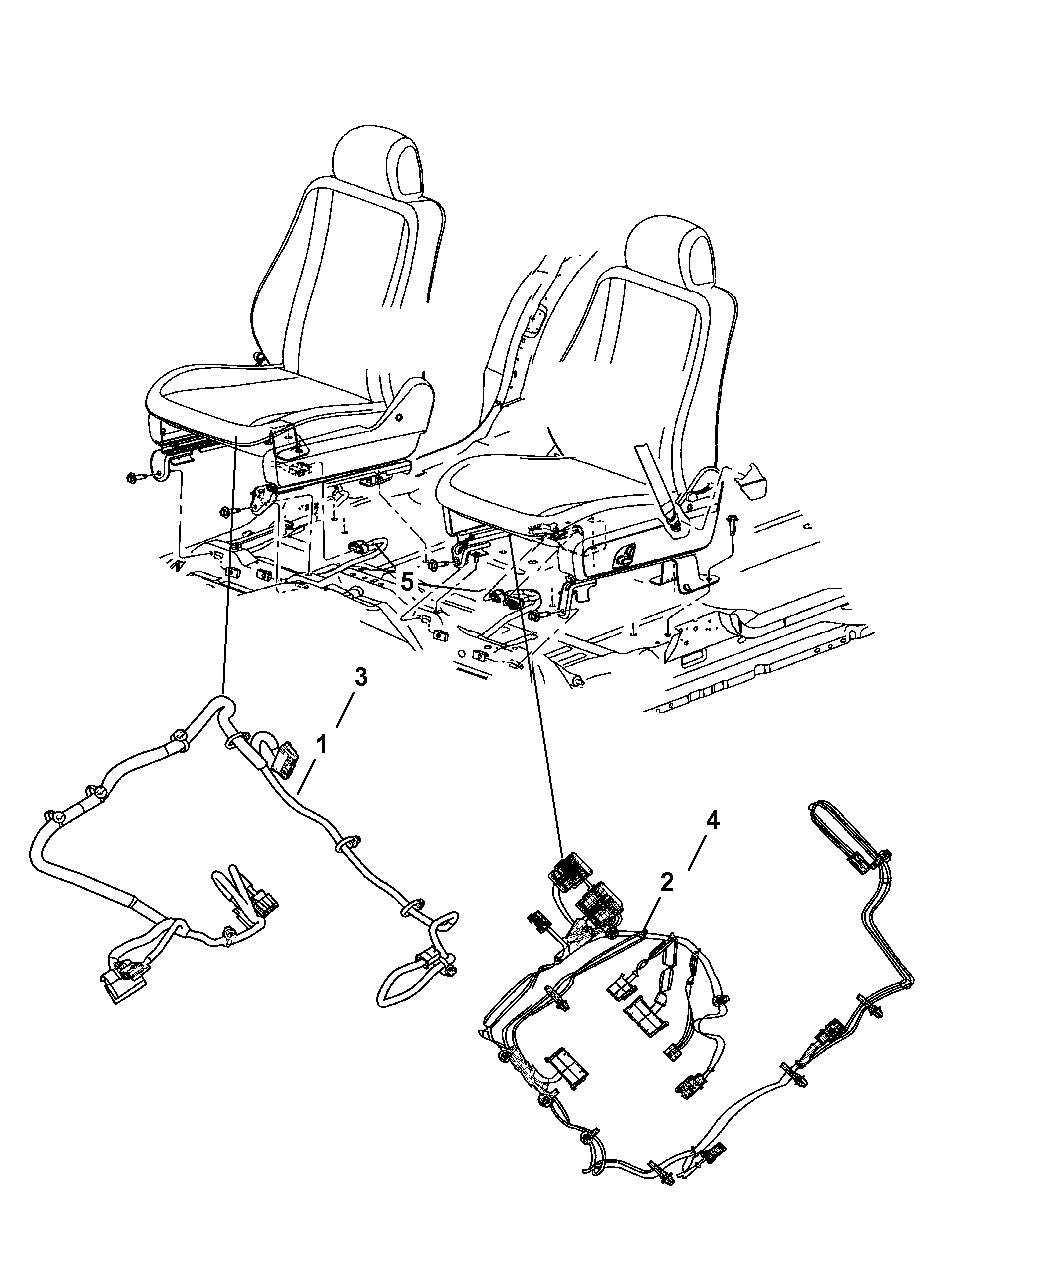 2006 Dodge Durango Wiring - Seats